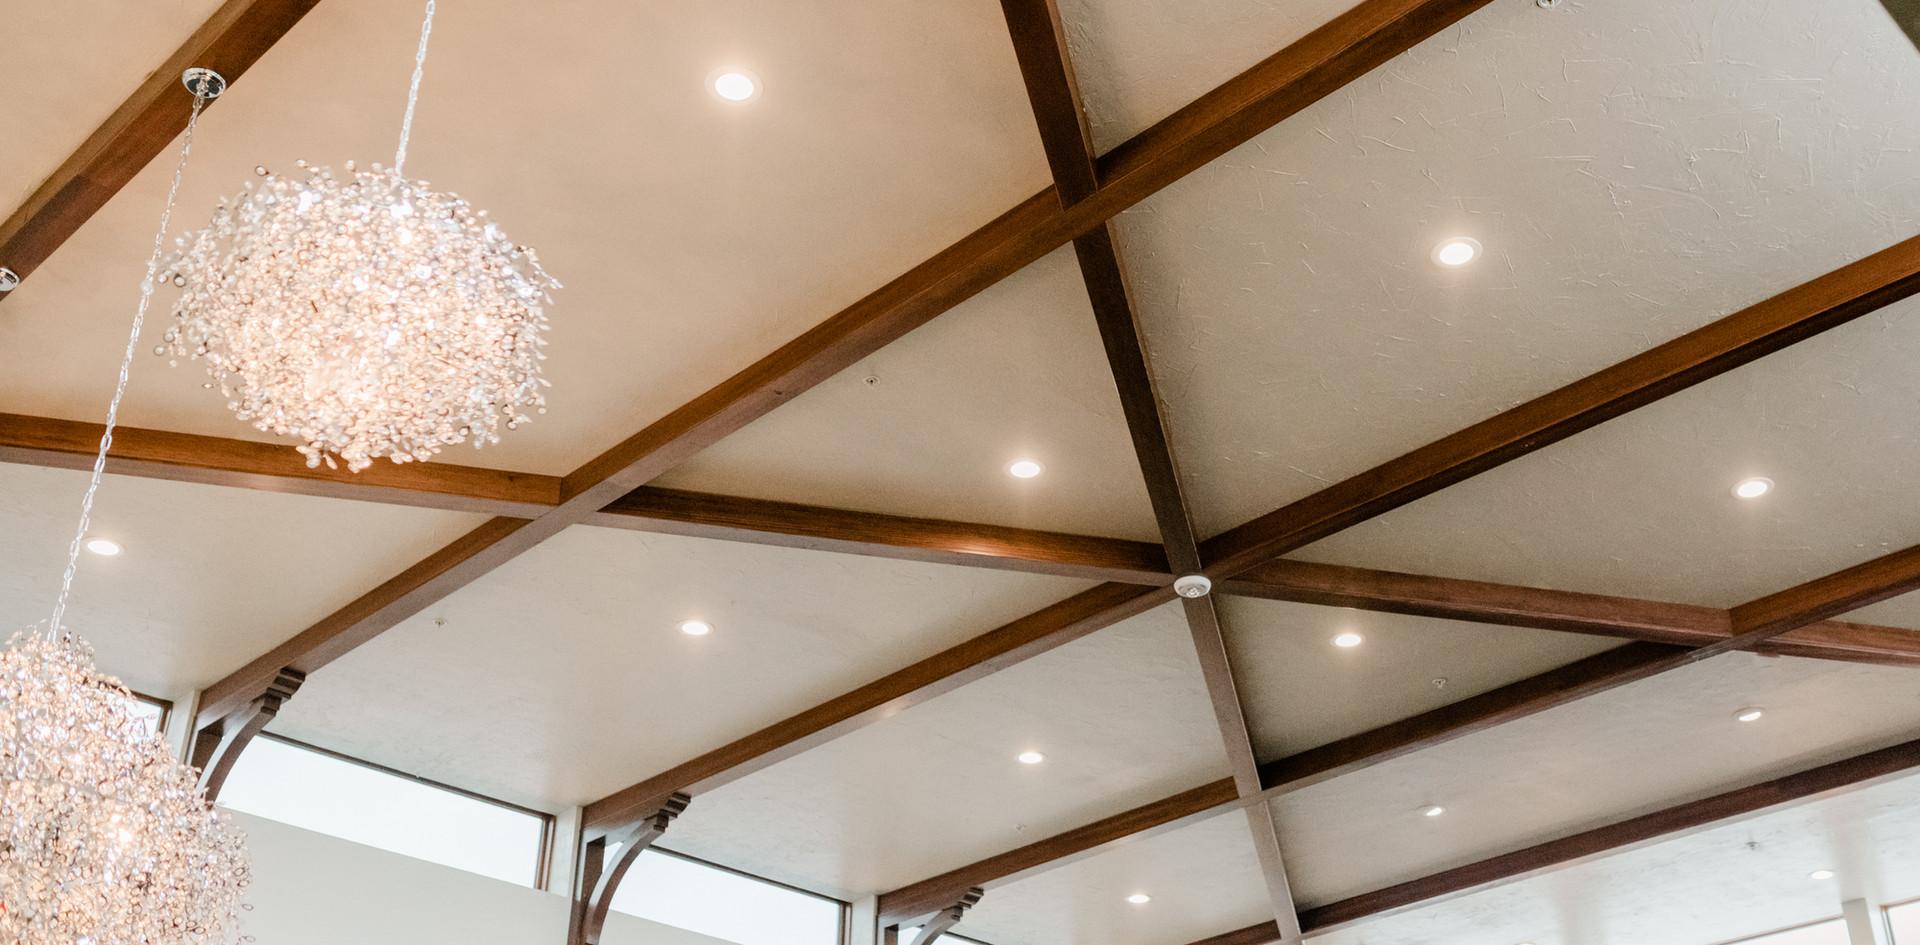 Texas Mesquite Hardwood Ceiling Material